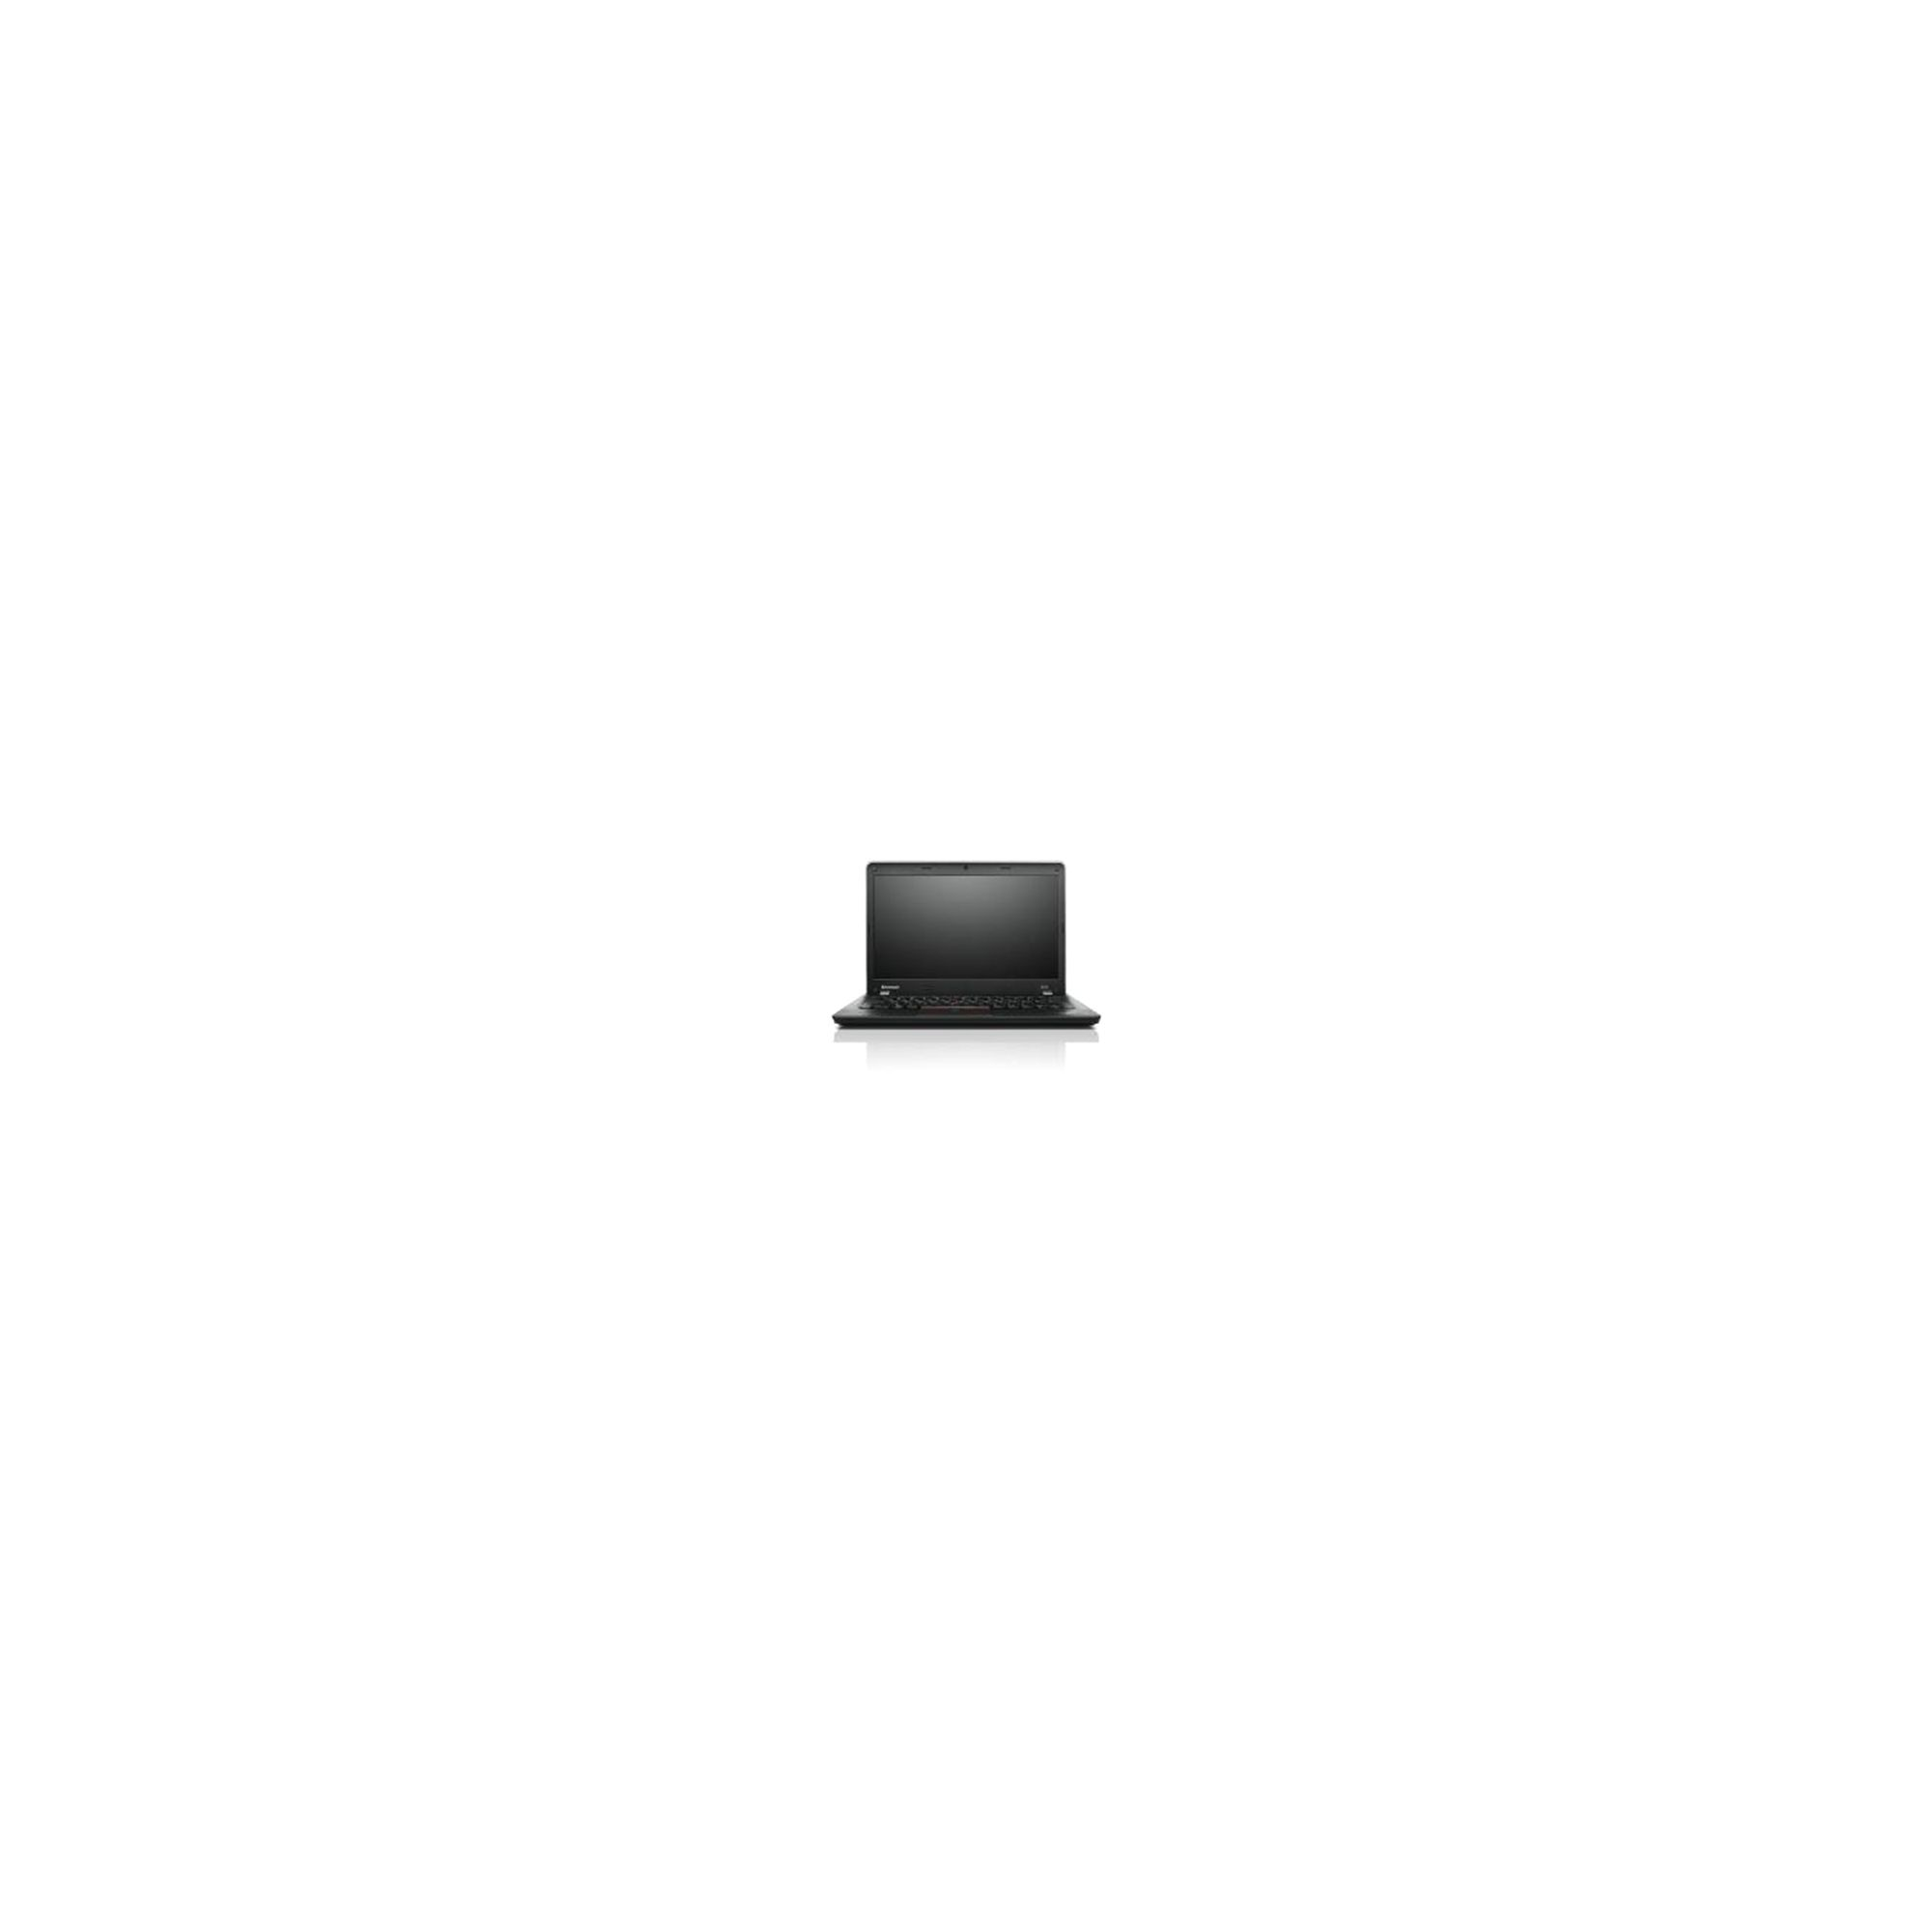 Lenovo ThinkPad Edge E330 3354BJG (13.3 inch) Notebook Core i5 (3210M) 2.5GHz 4GB 500GB WLAN BT Webcam Windows 7 Pro 64-bit/Windows 8 Pro 64-bit RDVD at Tesco Direct